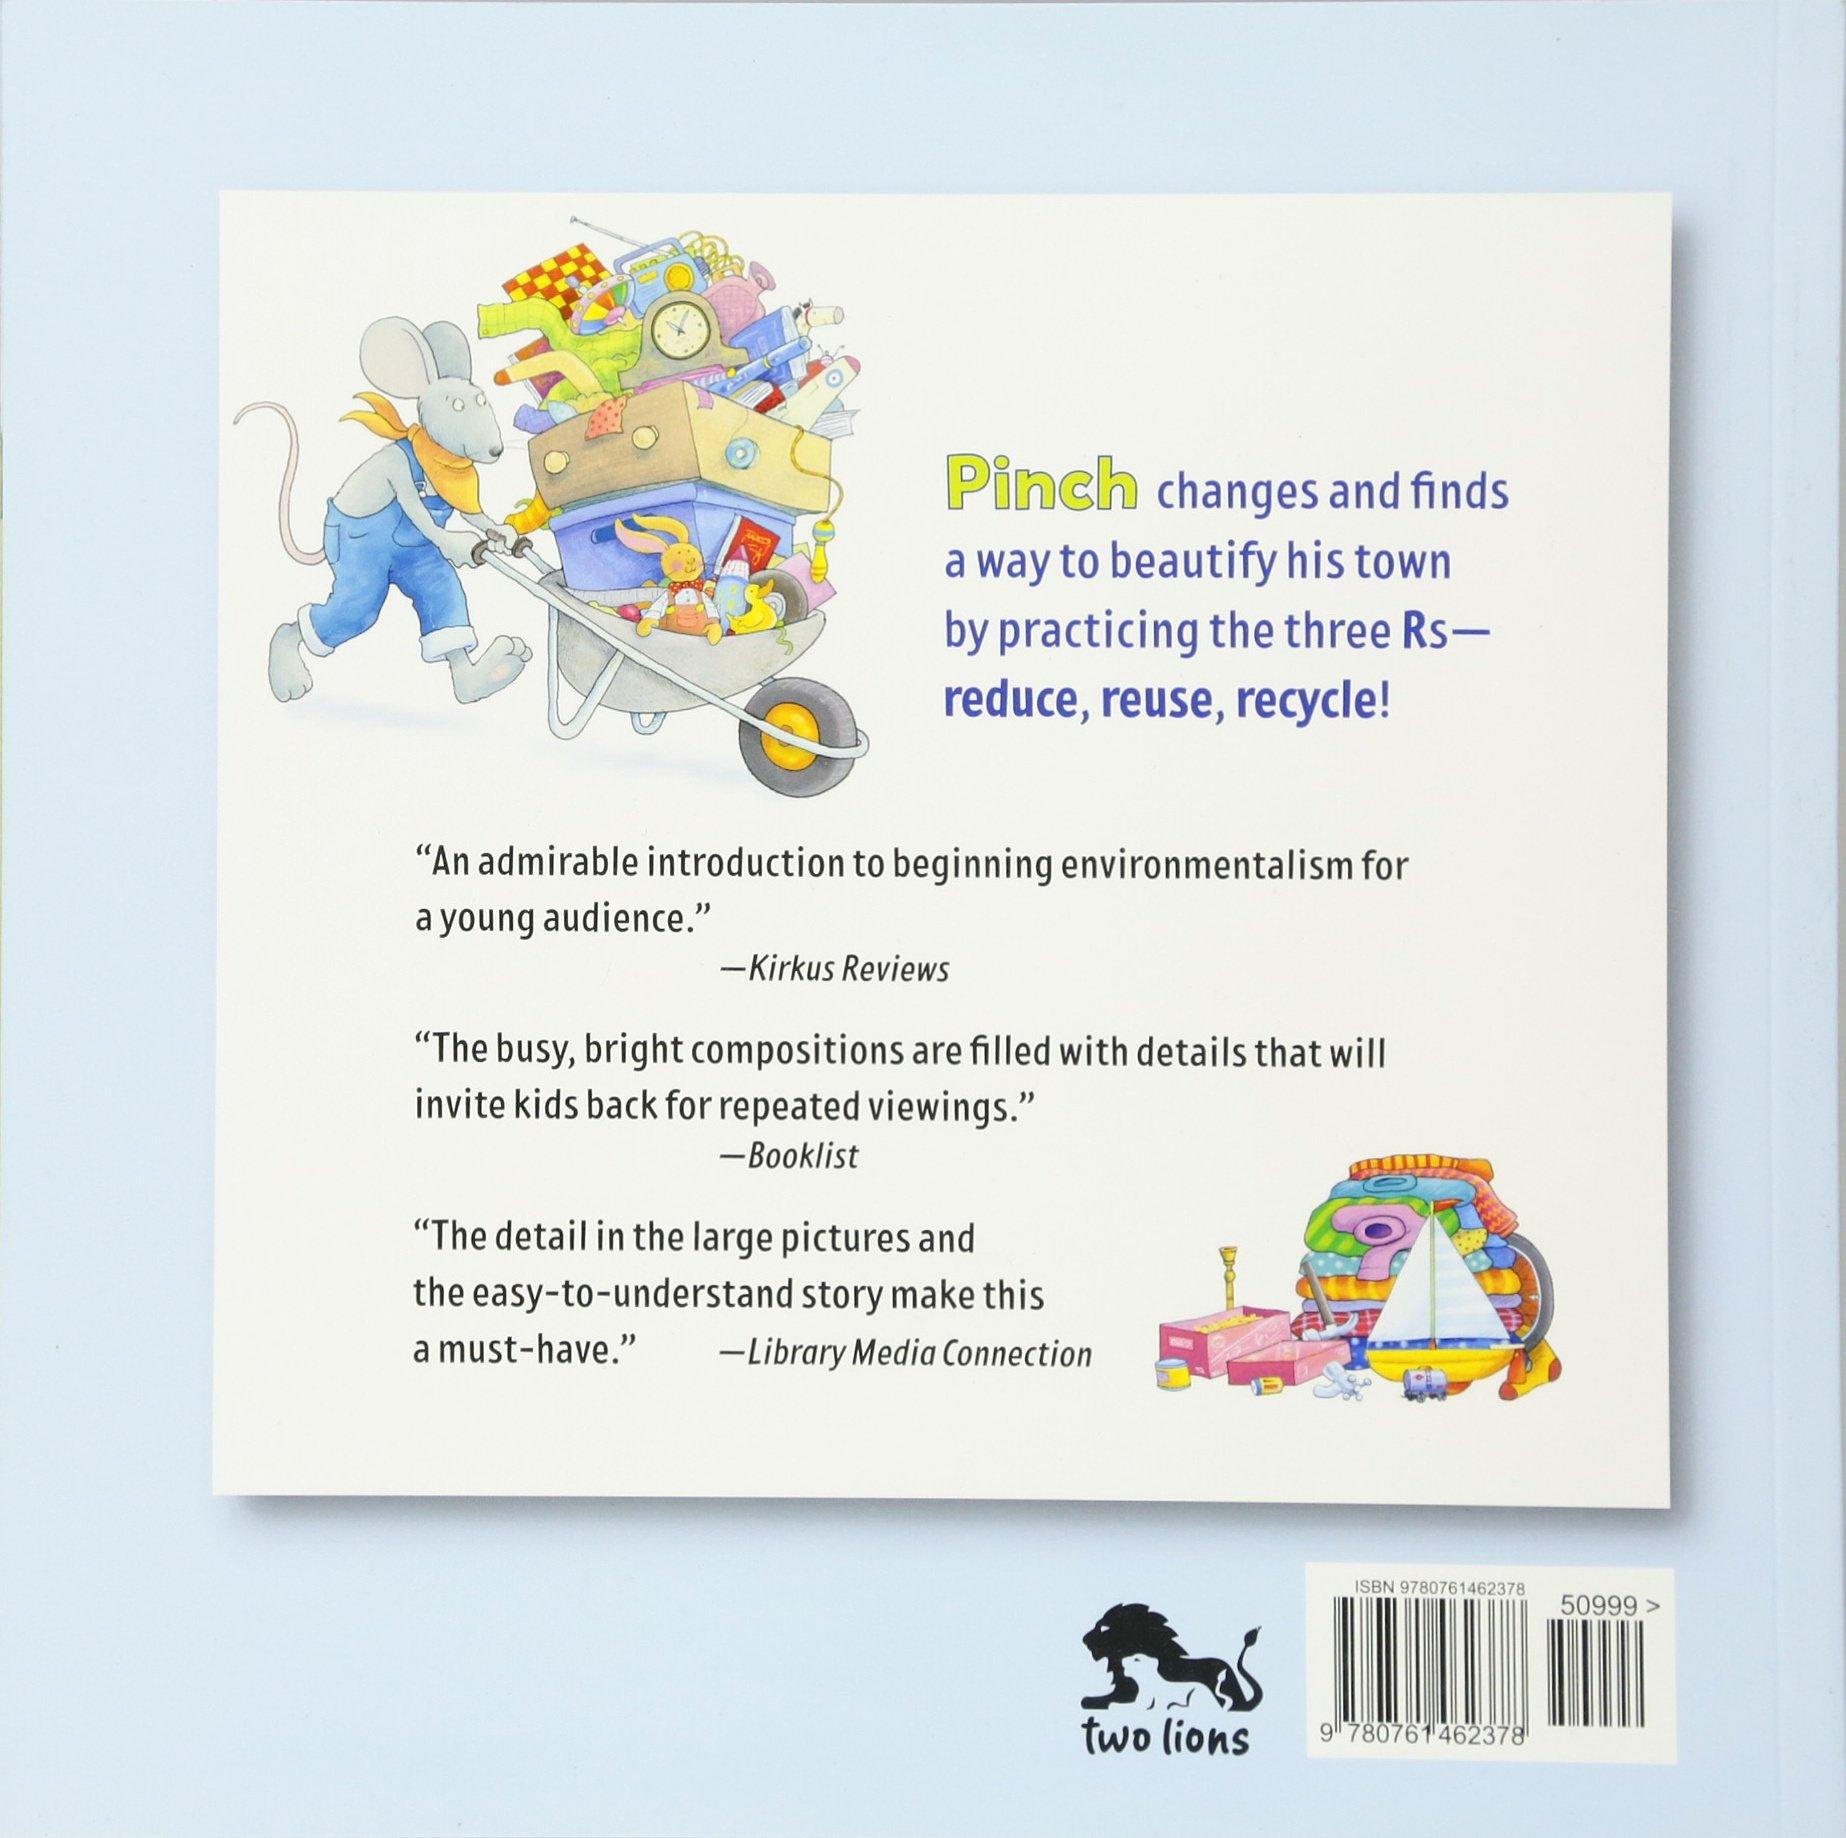 atls manual 10th edition pdf